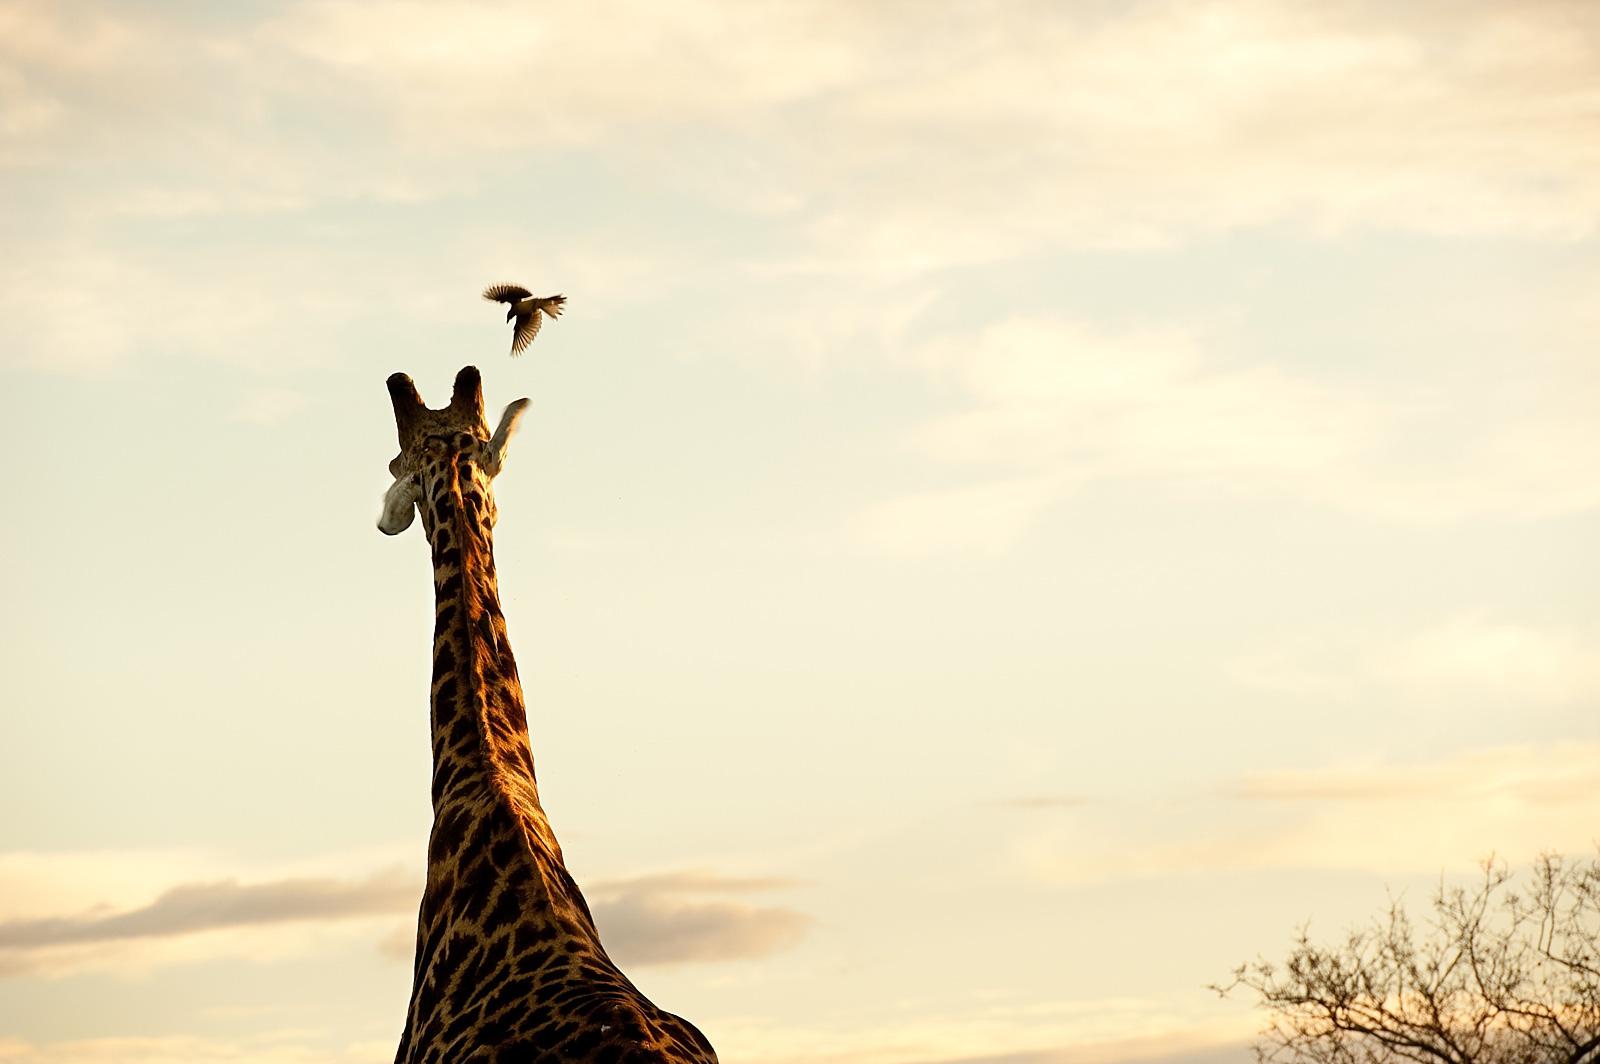 Jacki-Bruniquel-South-African-Photographer-Travel-Photos-01